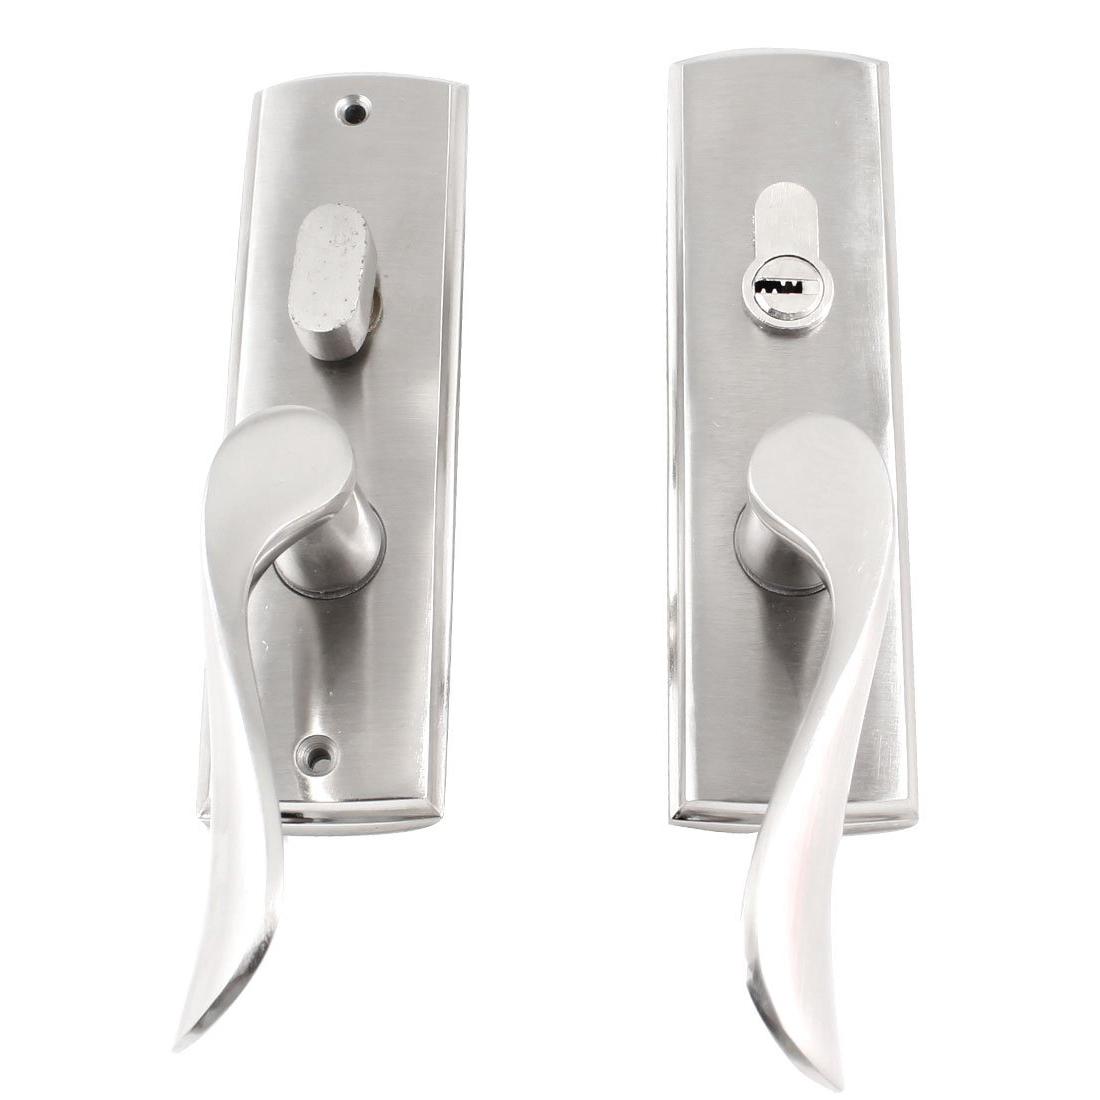 NFLC Household Door Bedroom Metal Safety Handle Lock Latch Silver Tone w 3 Keys<br><br>Aliexpress